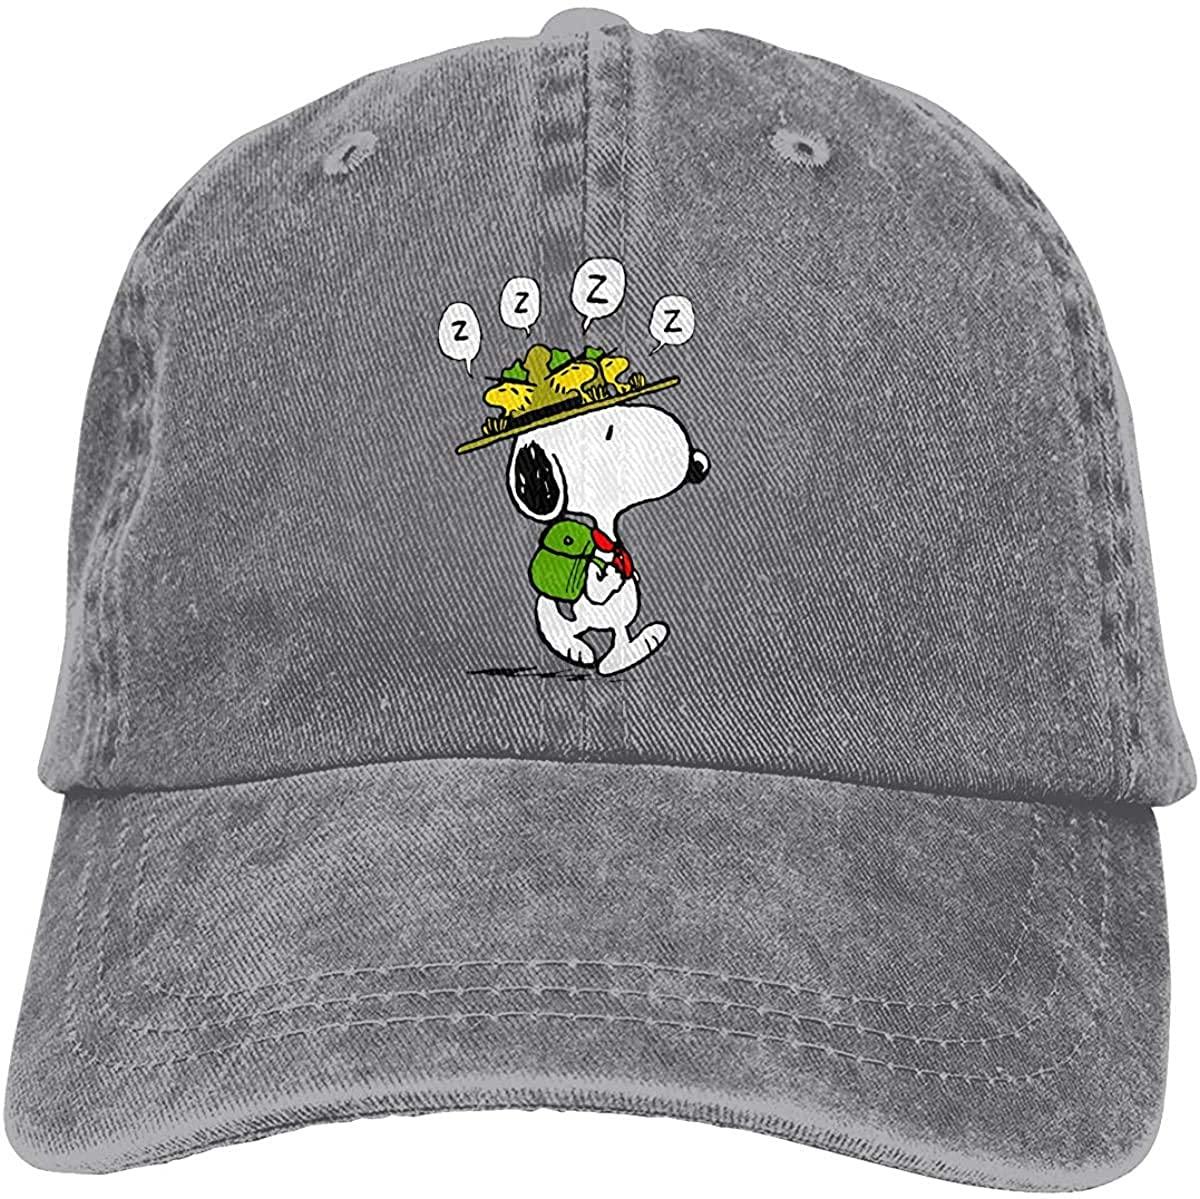 KURITIAN Snoopy Lightweight Quick Dry Breathable Baseball Cap Outdoor Run Cap Fashion Tide Cap Casual Sun Hat Adjustable Classic Sports Hat Grey